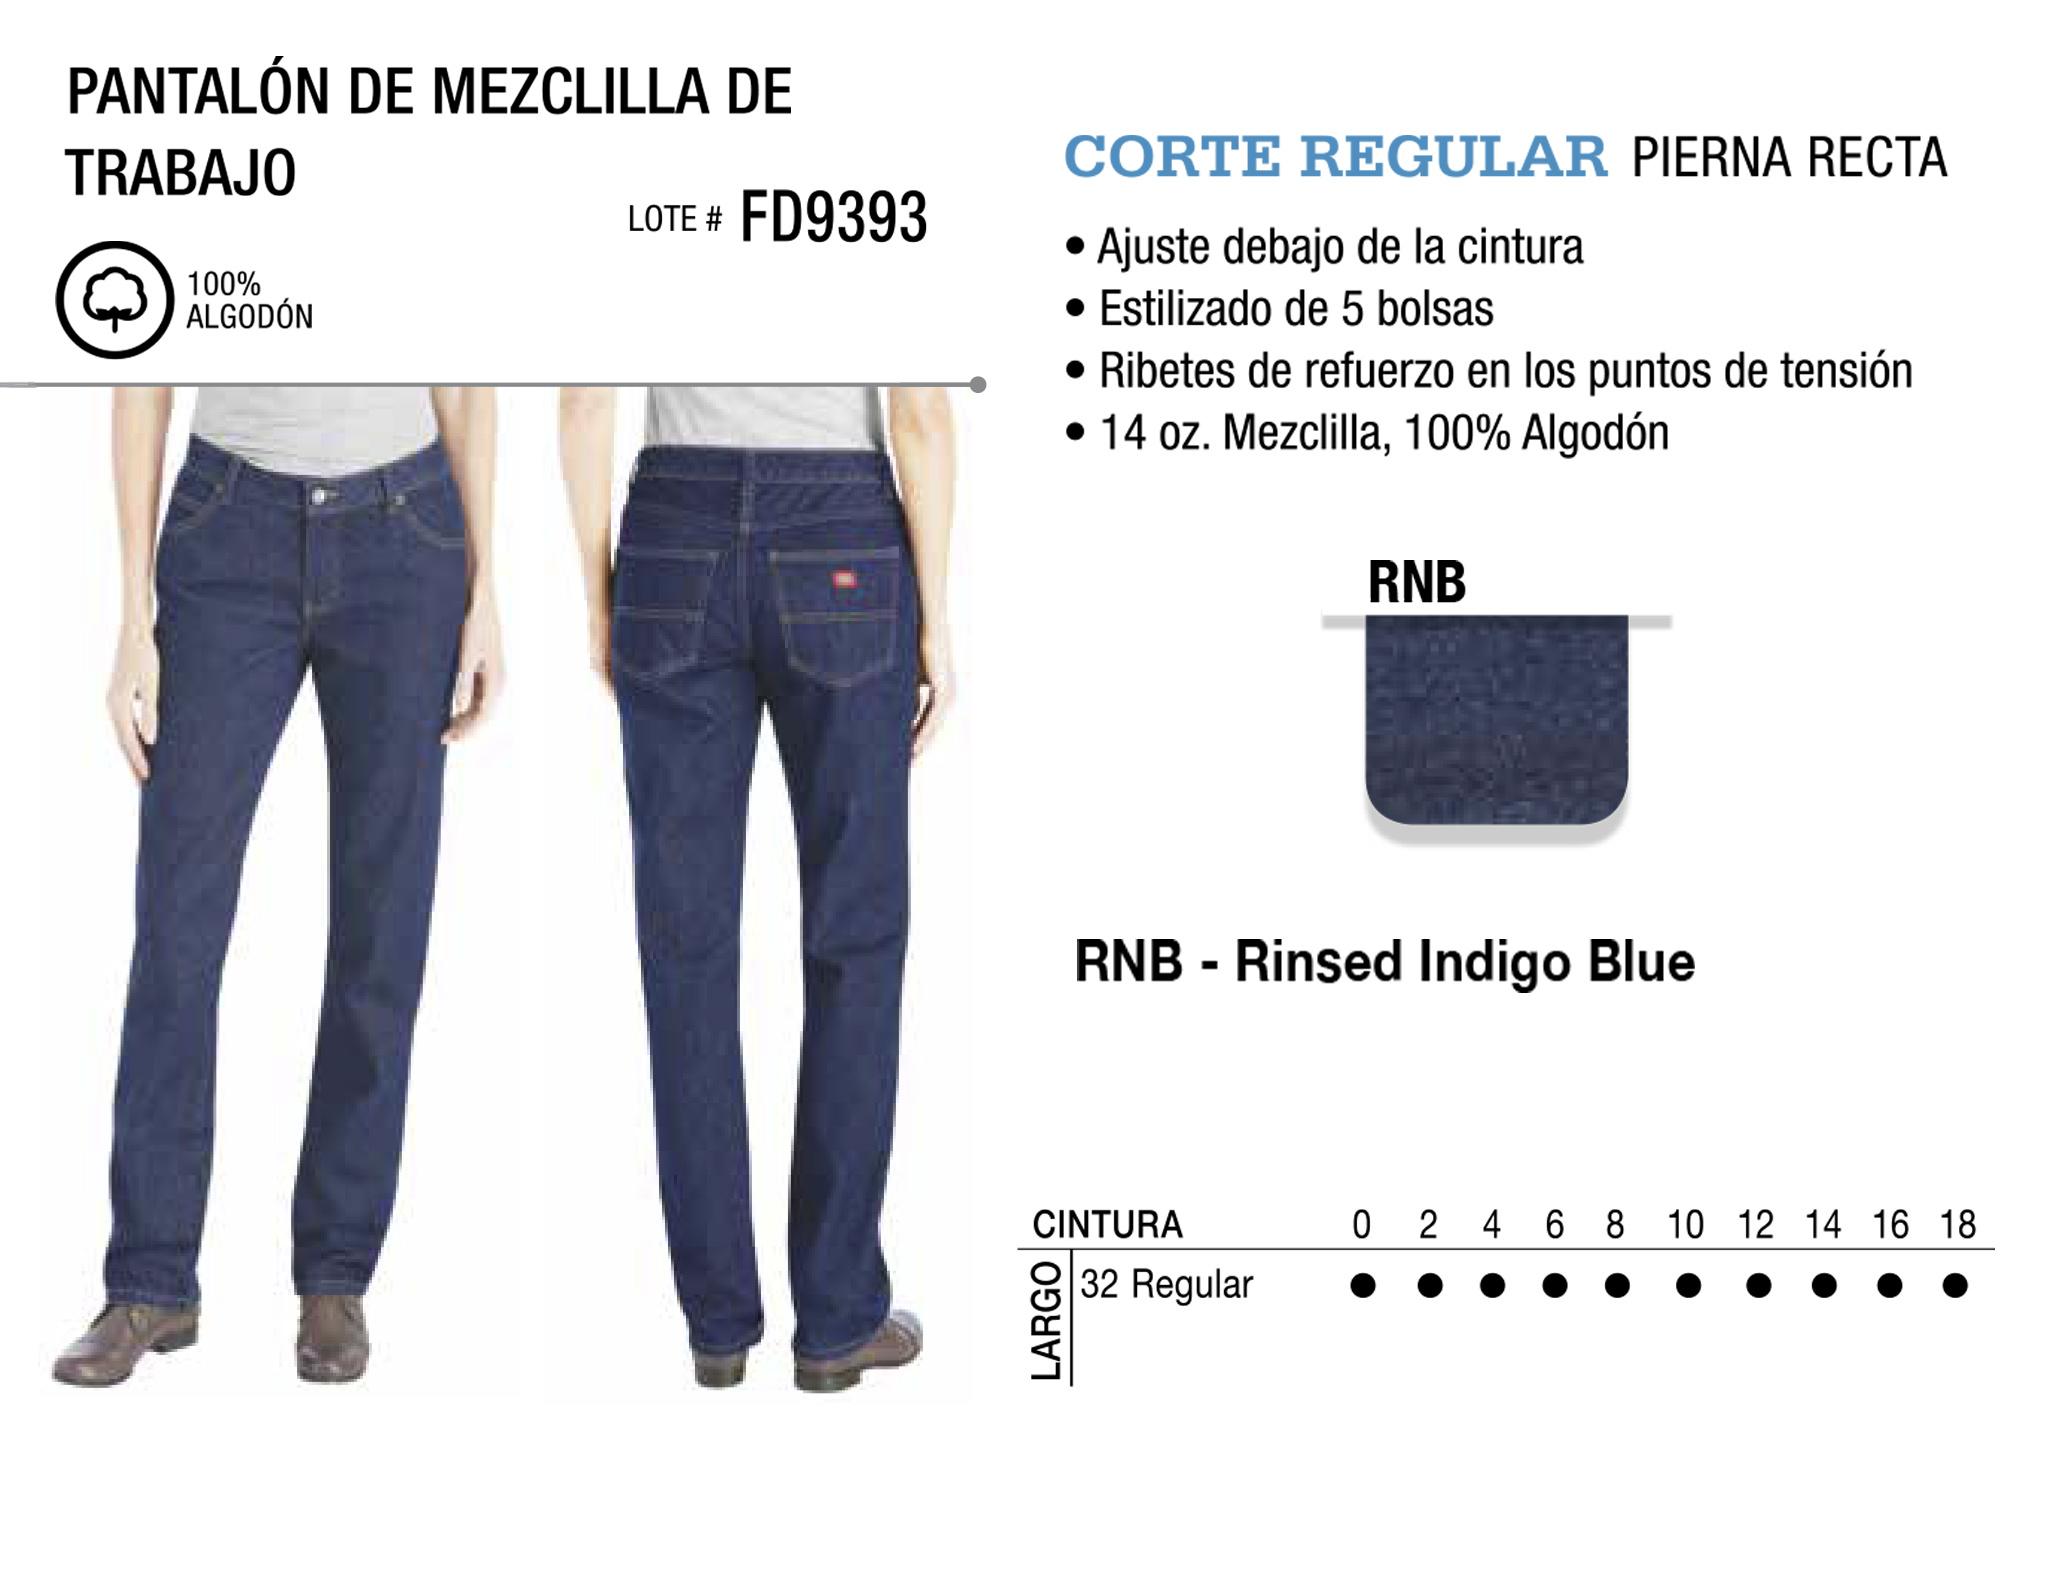 Pantalón de Mezclilla de Trabajo. Corte Regular. FD9393.